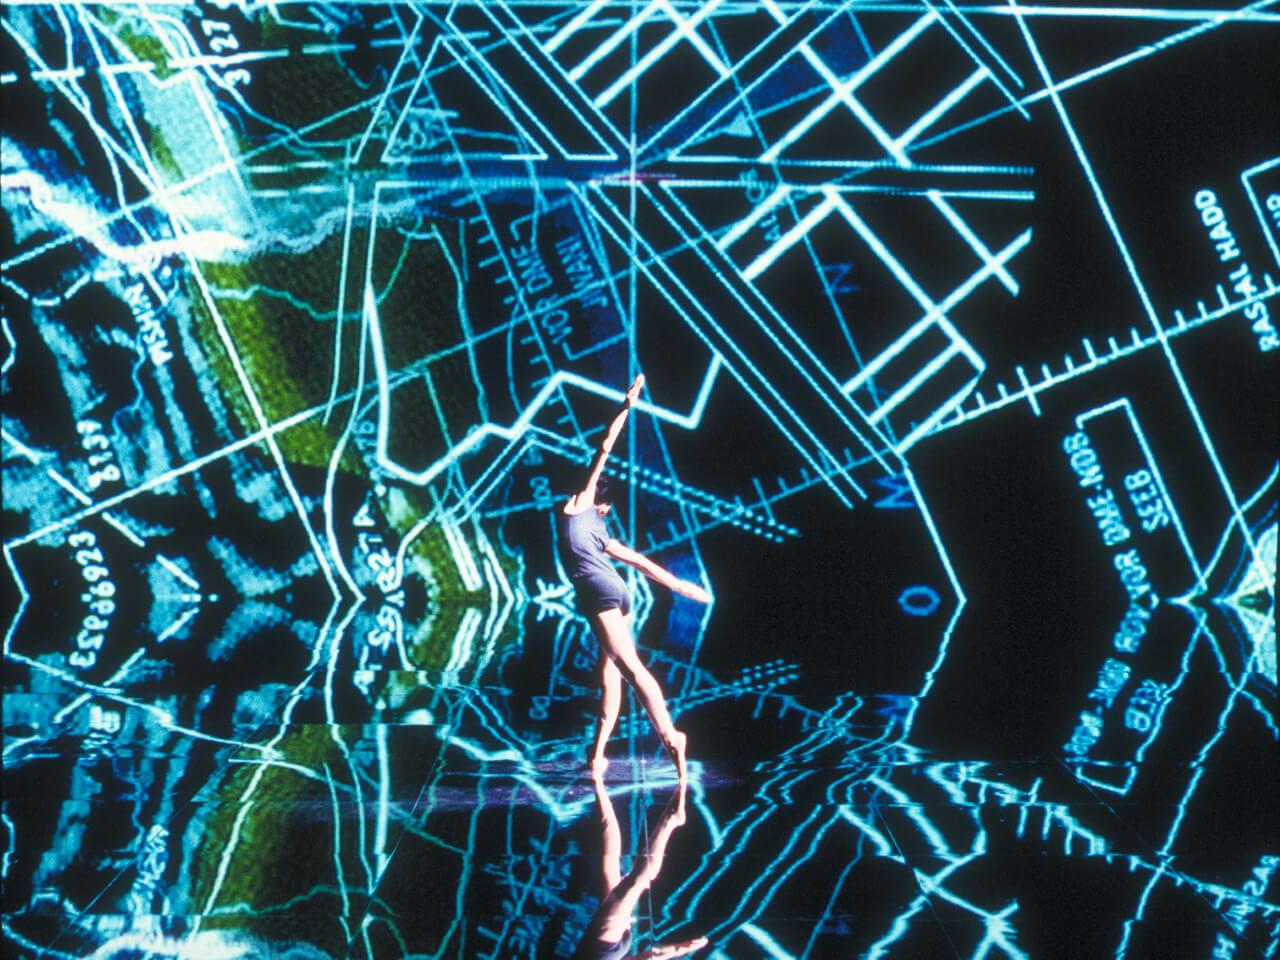 YCC Temporary ダムタイプ ポートフォリオ 現代美術・アート Contemporary Art オフソサエティ offsociety